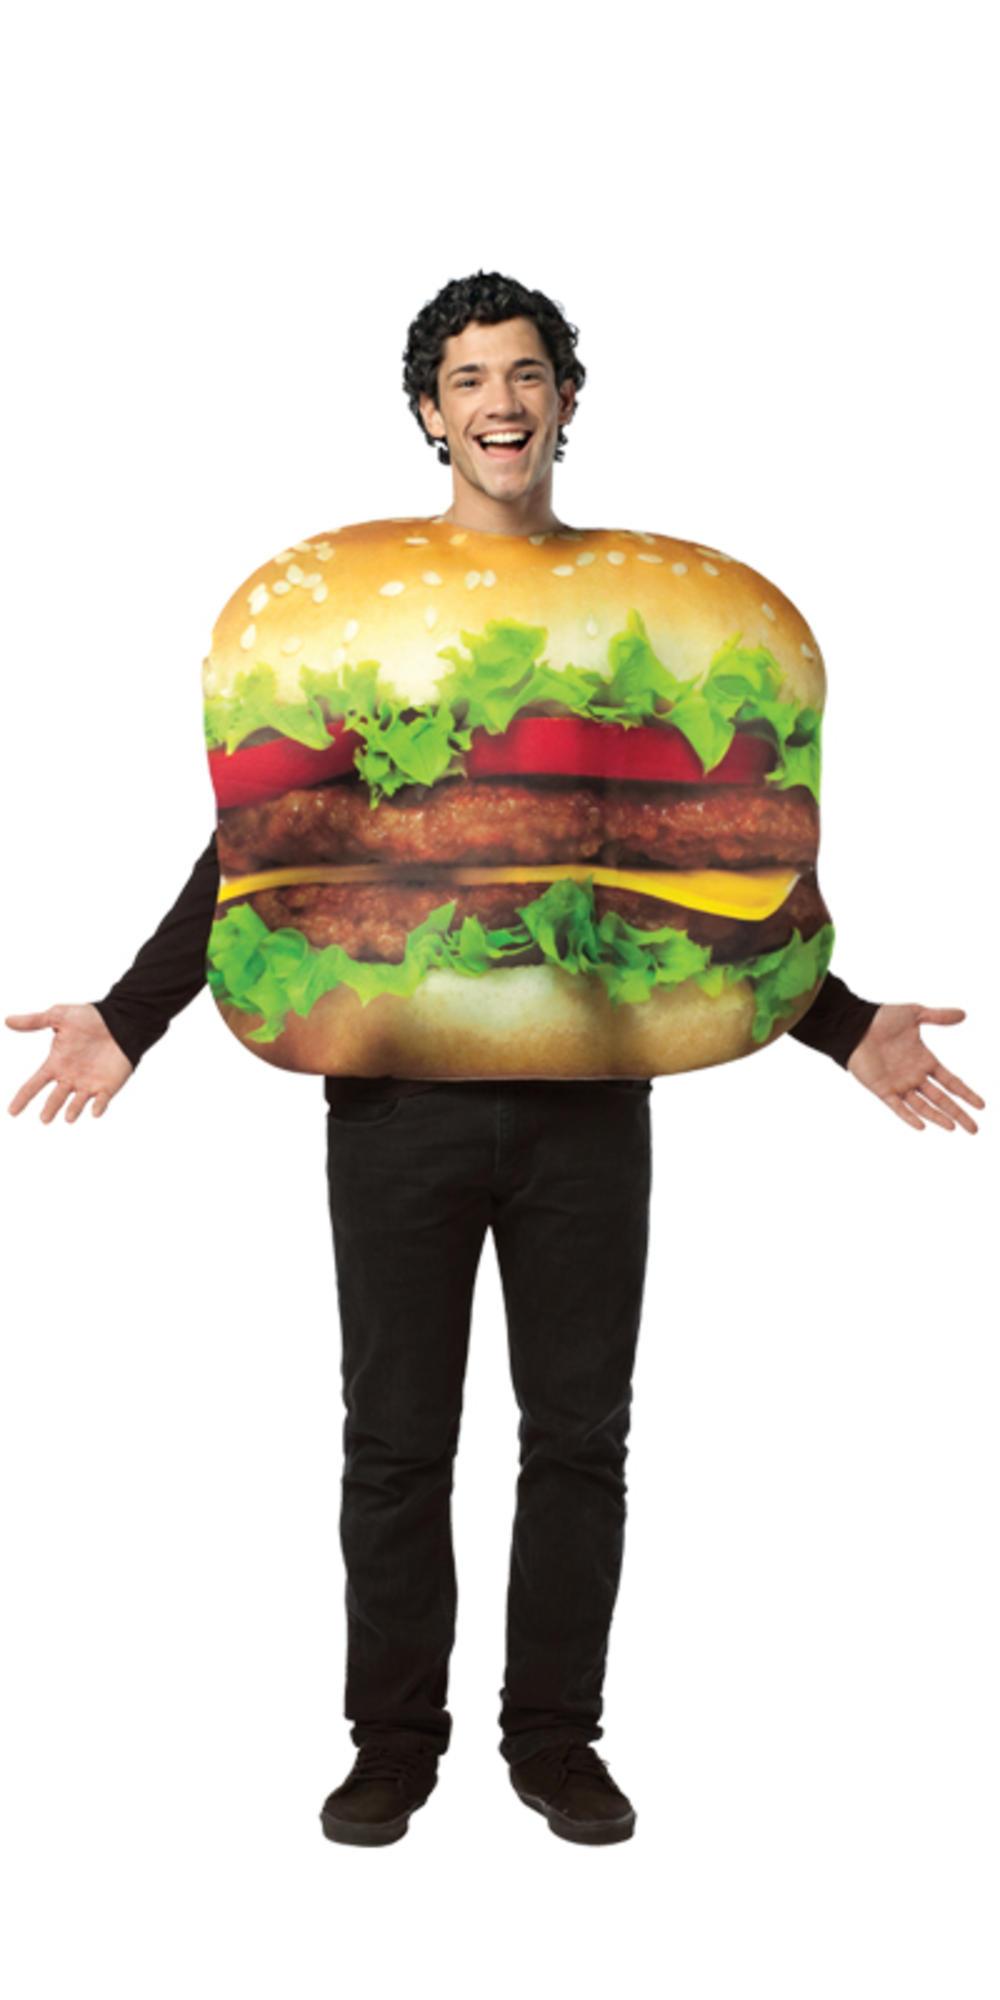 Get Real Cheeseburger Costume